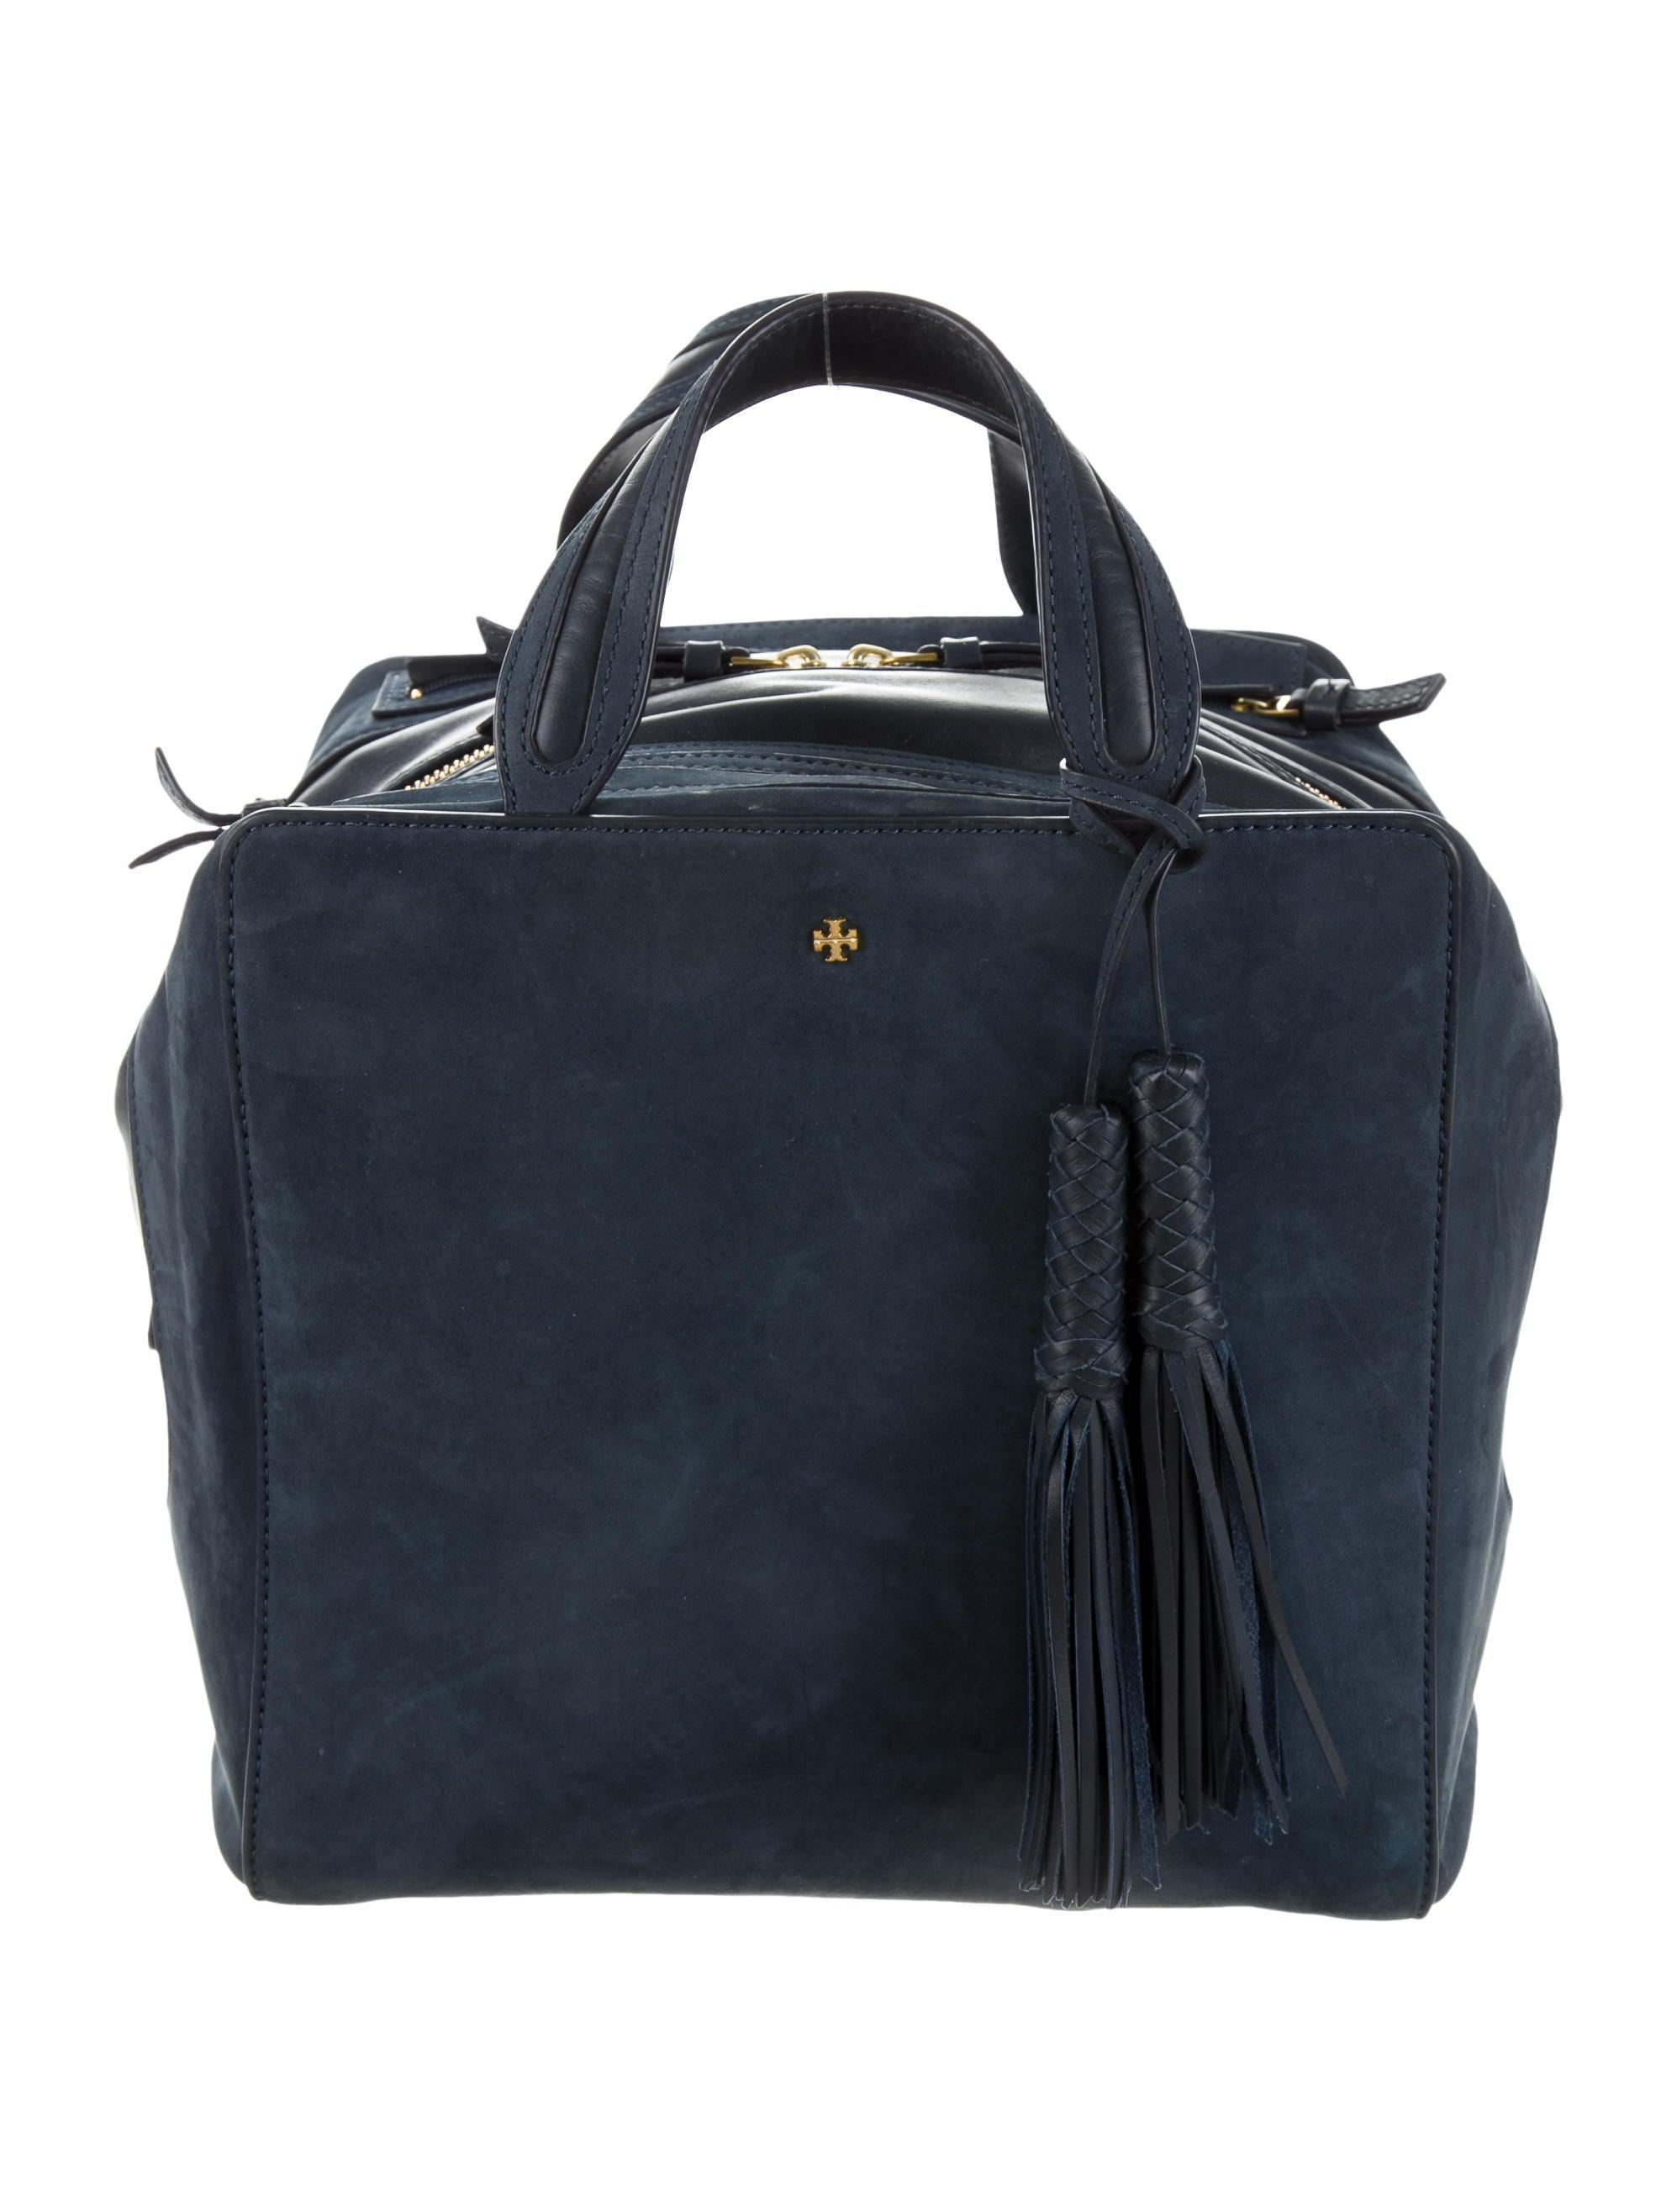 c9e167ce73b Tory Burch Tassel Cube Satchel - Handbags - WTO71517